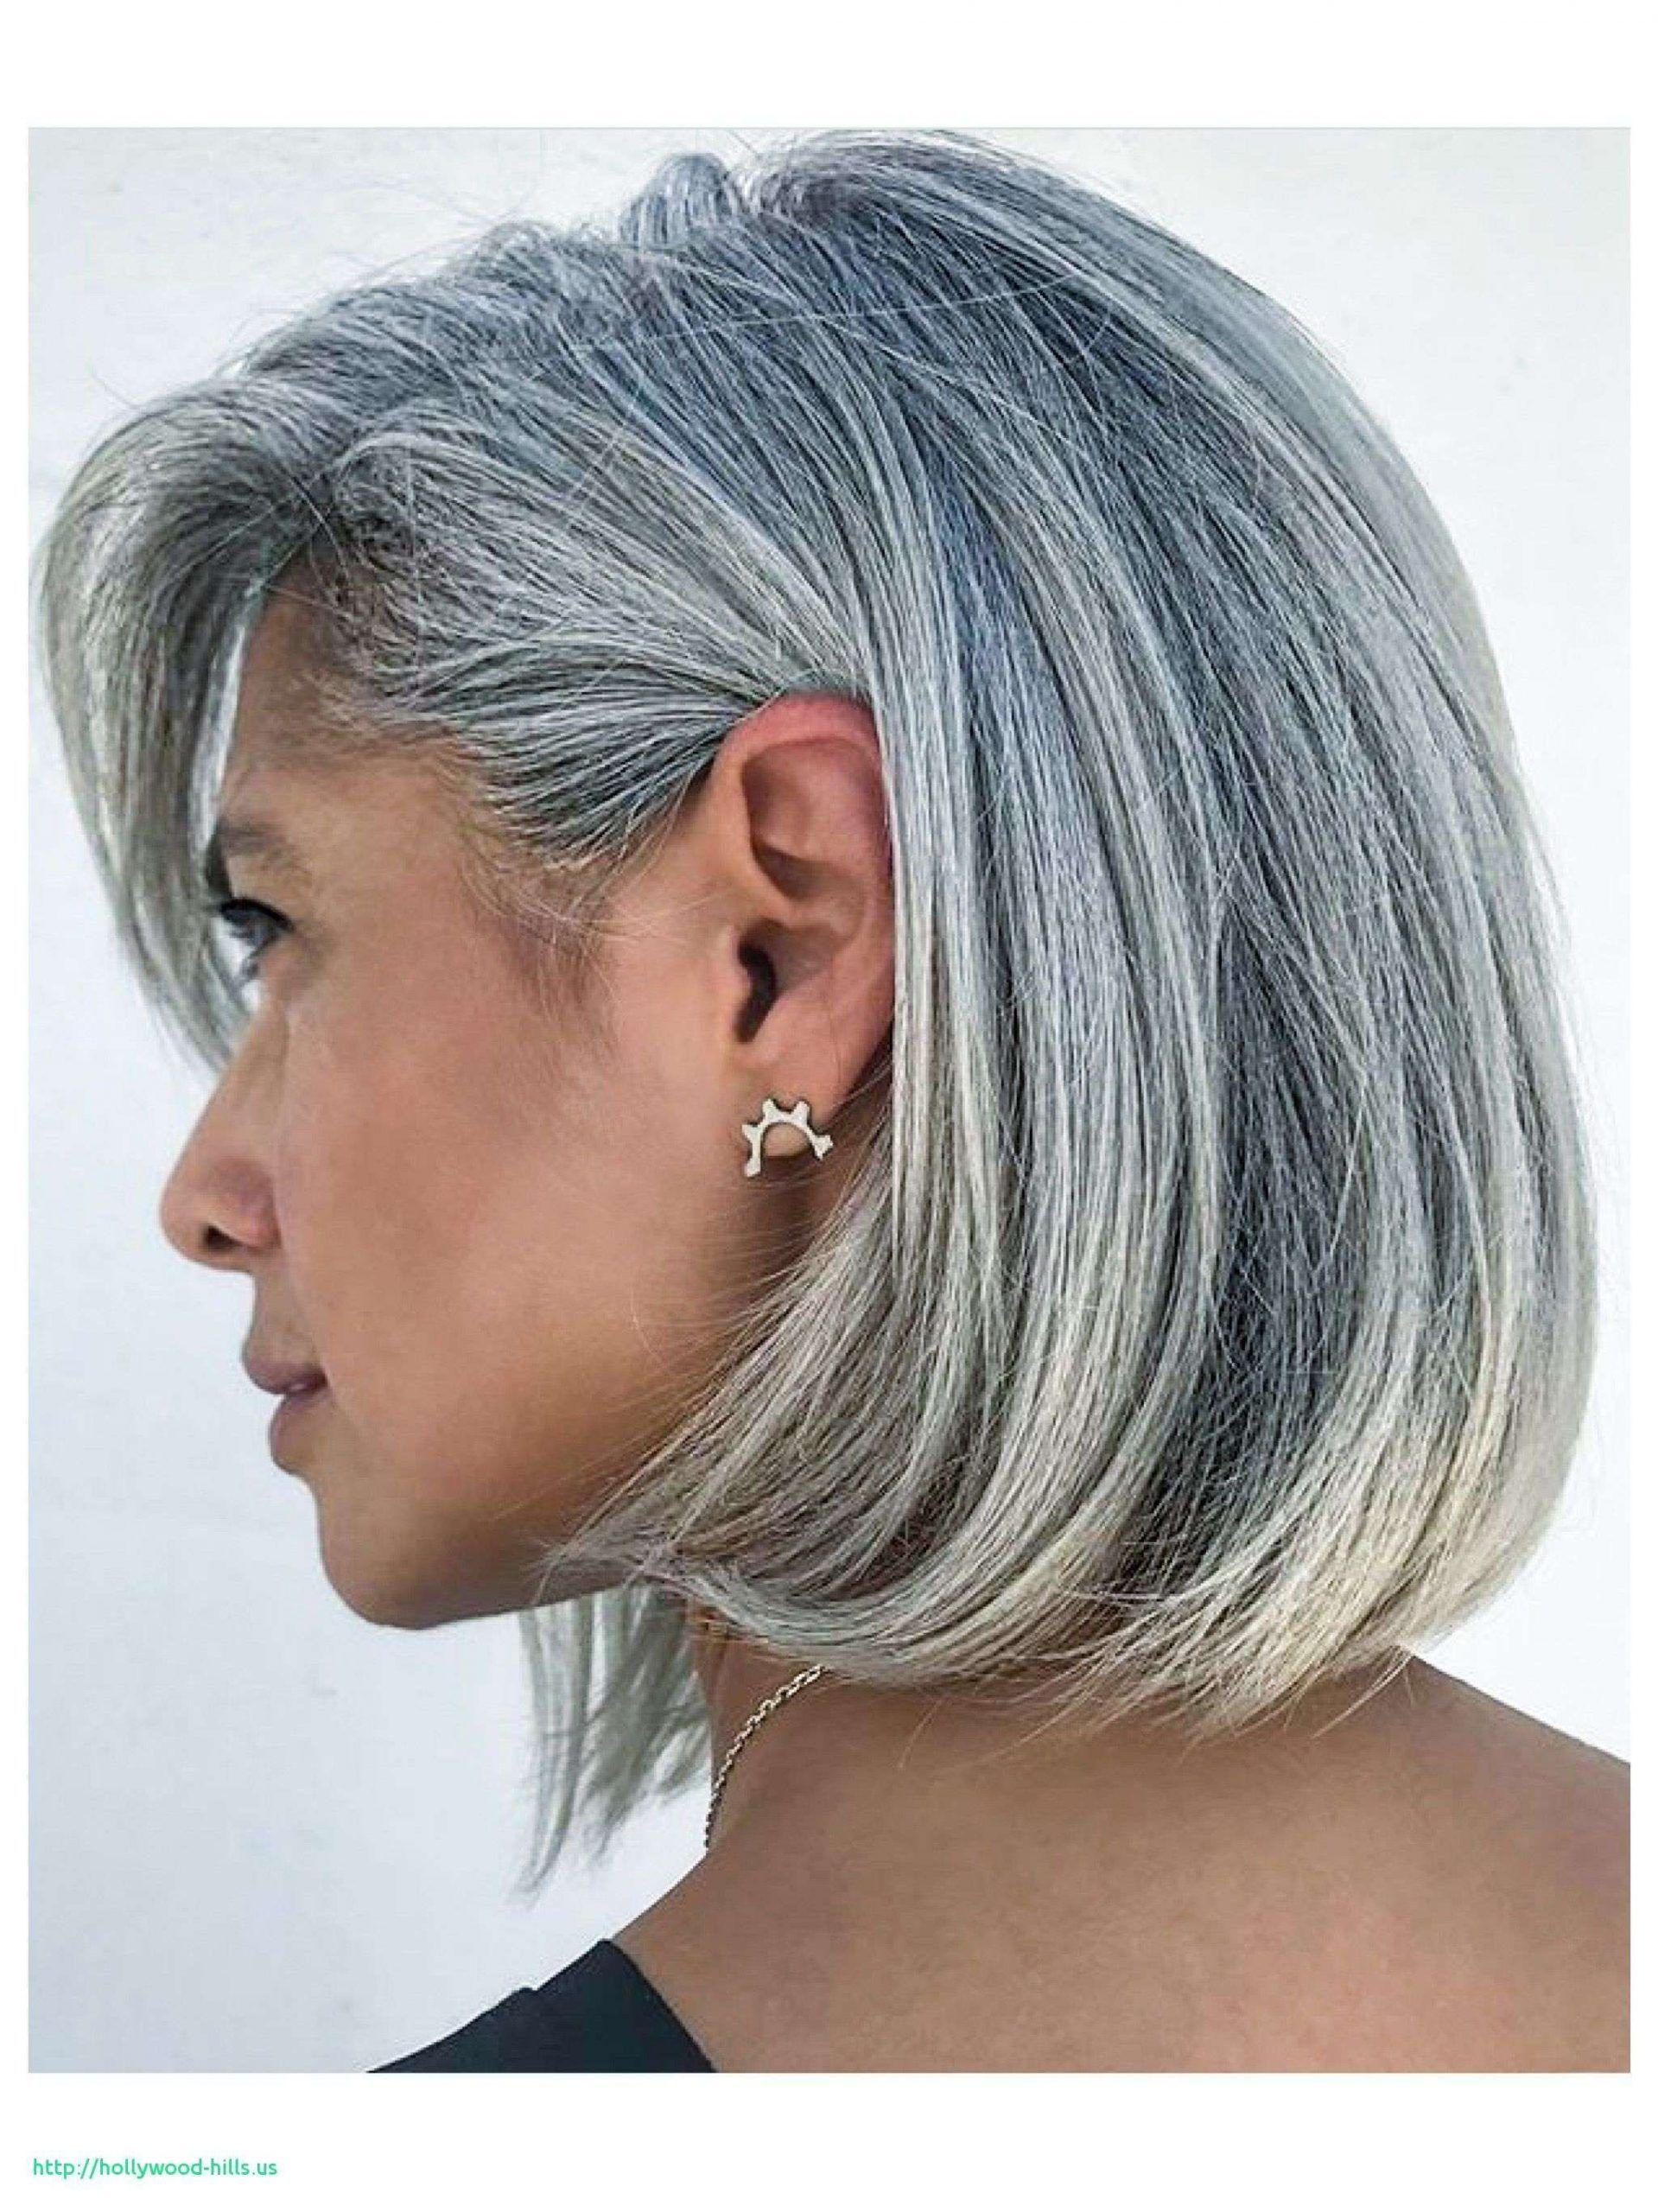 Elegantes Haar Fur Uber Funfzig Neue Haare Modelle In 2020 Frisuren Graue Haare 50er Frisur Bob Frisur Grau